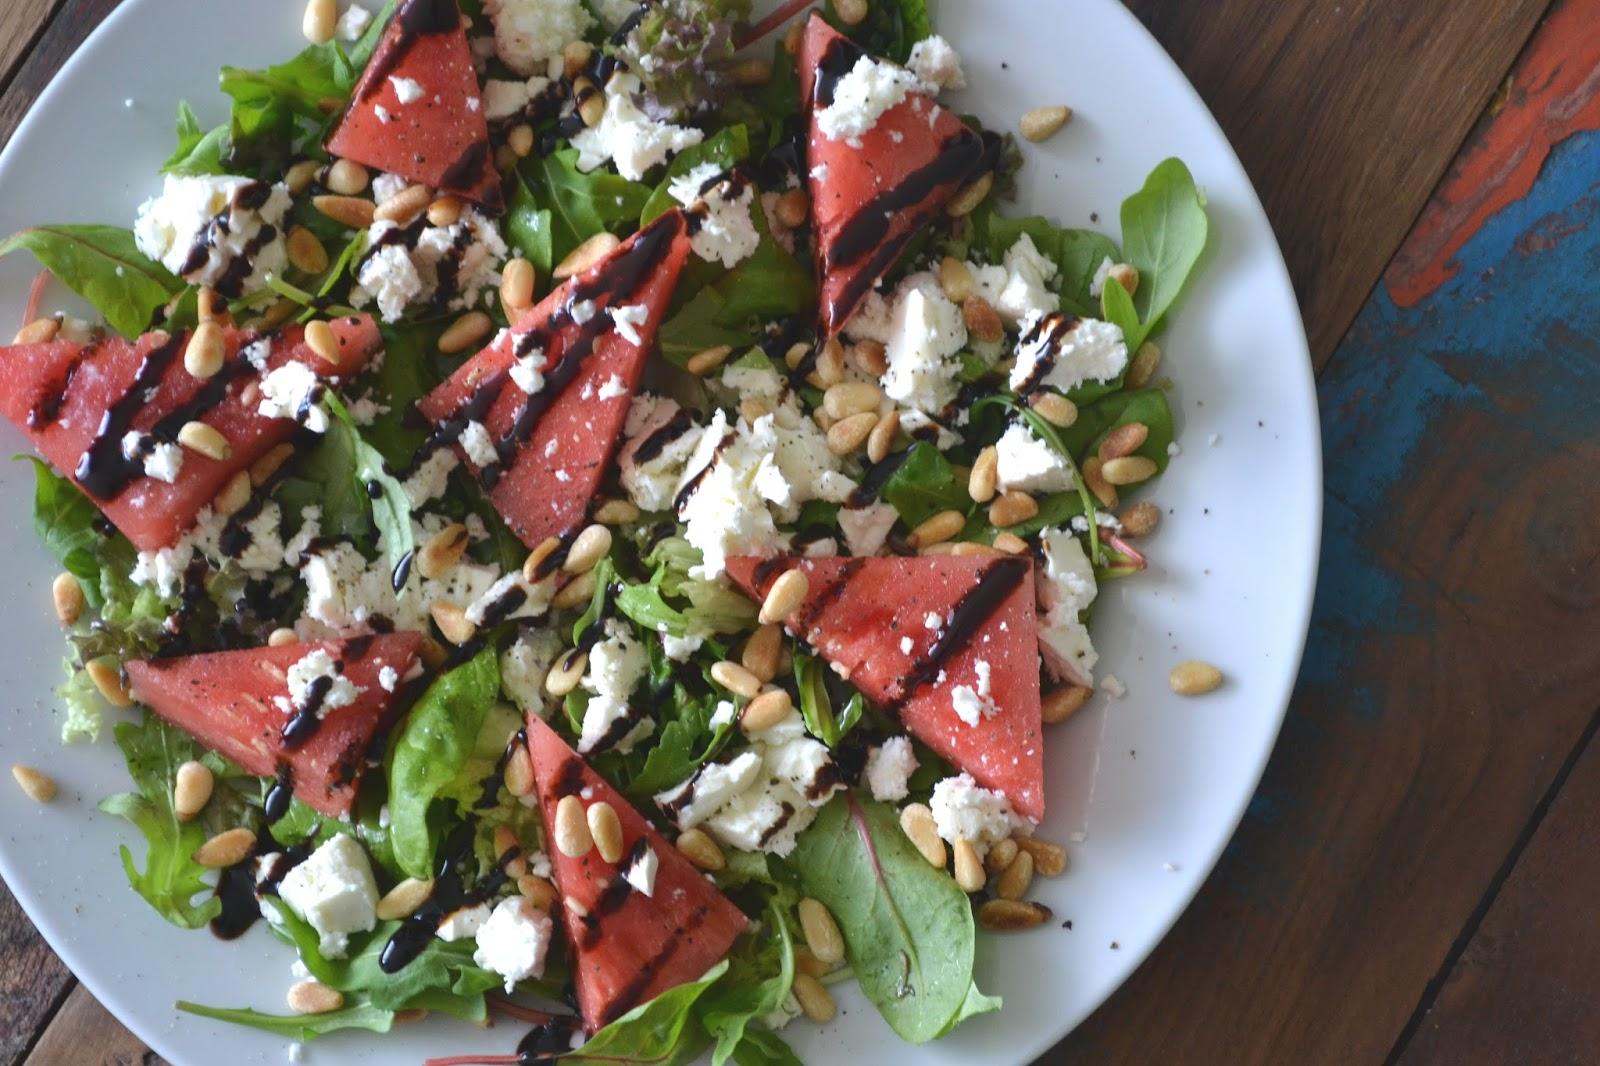 salade met feta en watermeloen